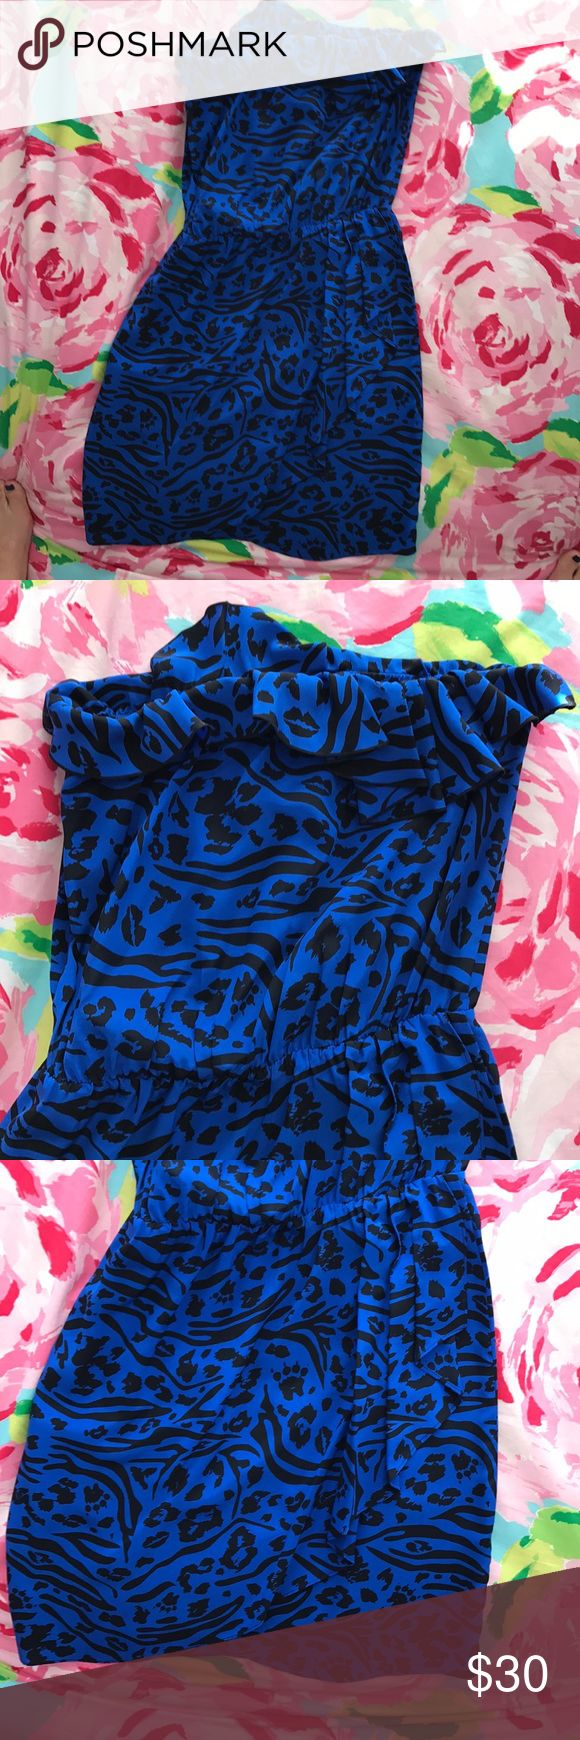 Amanda Uprichard Strapless Dress - S Beautiful cobalt & black silk strapless dress! Never worn! Amanda Uprichard Dresses